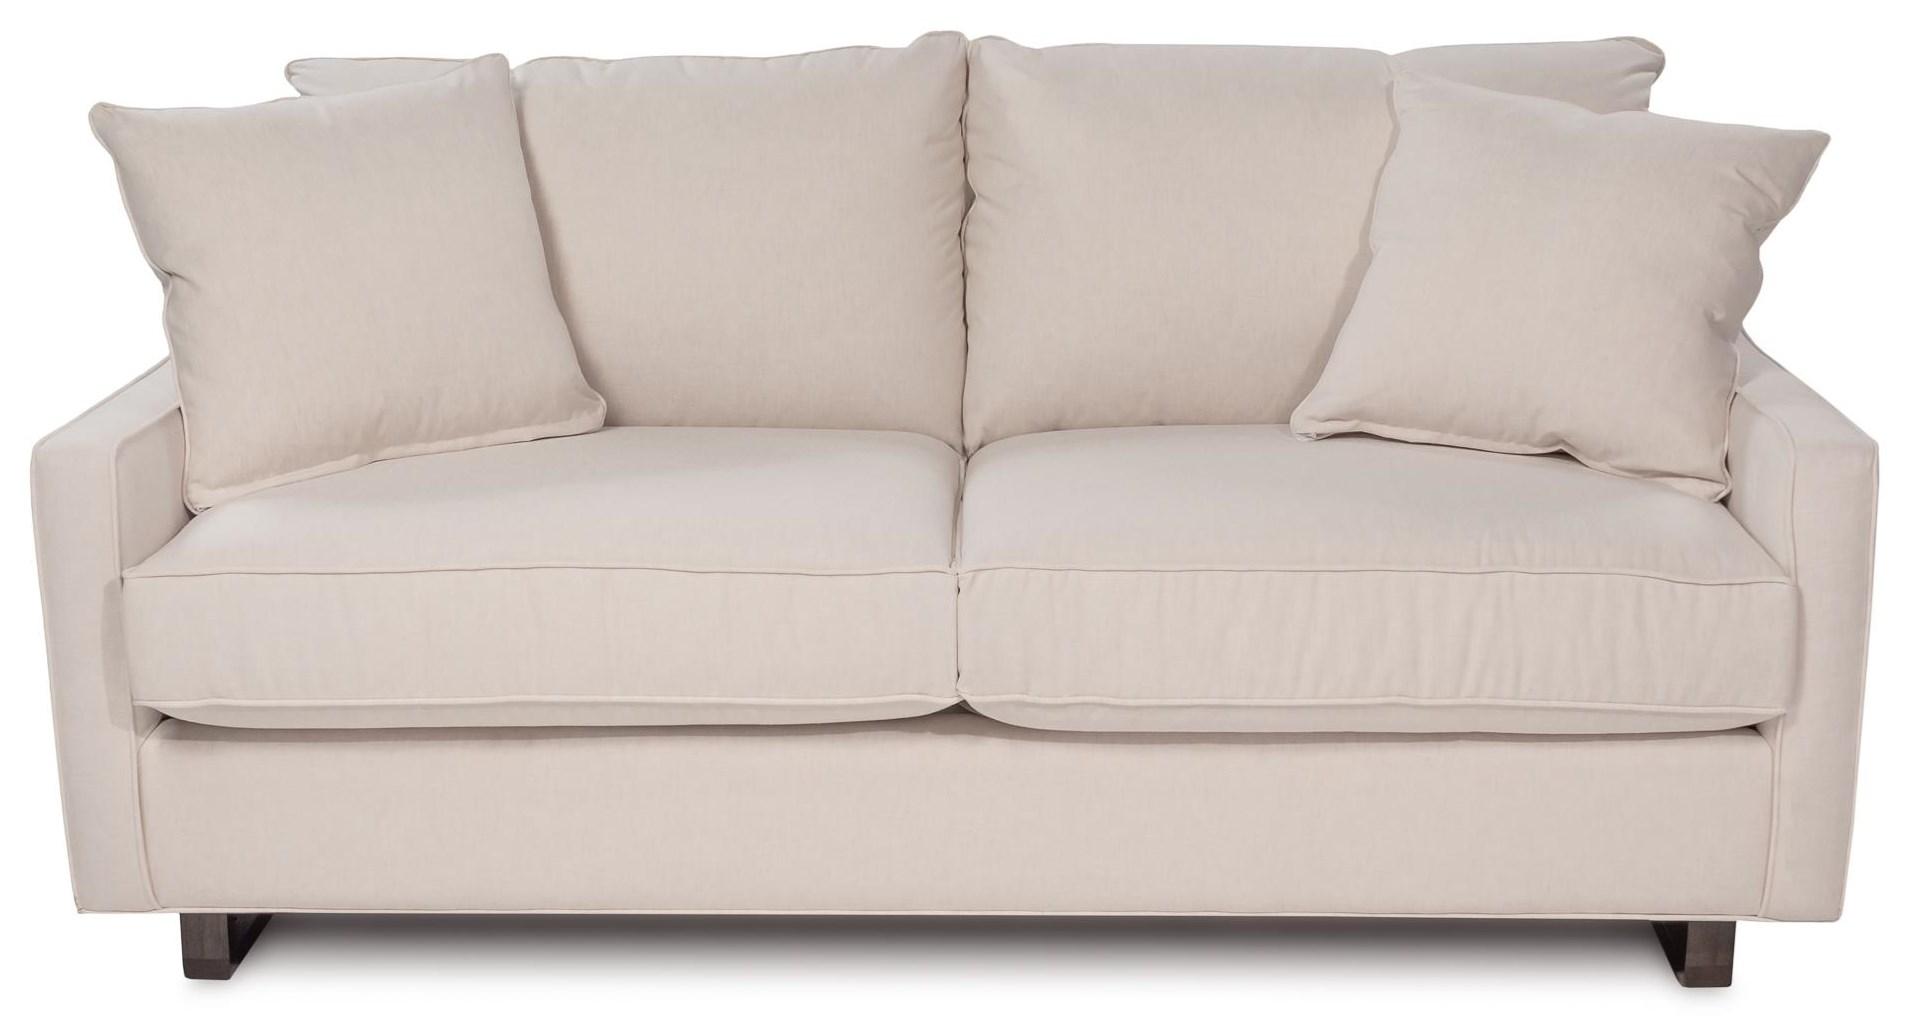 Customizable Studio Sofa